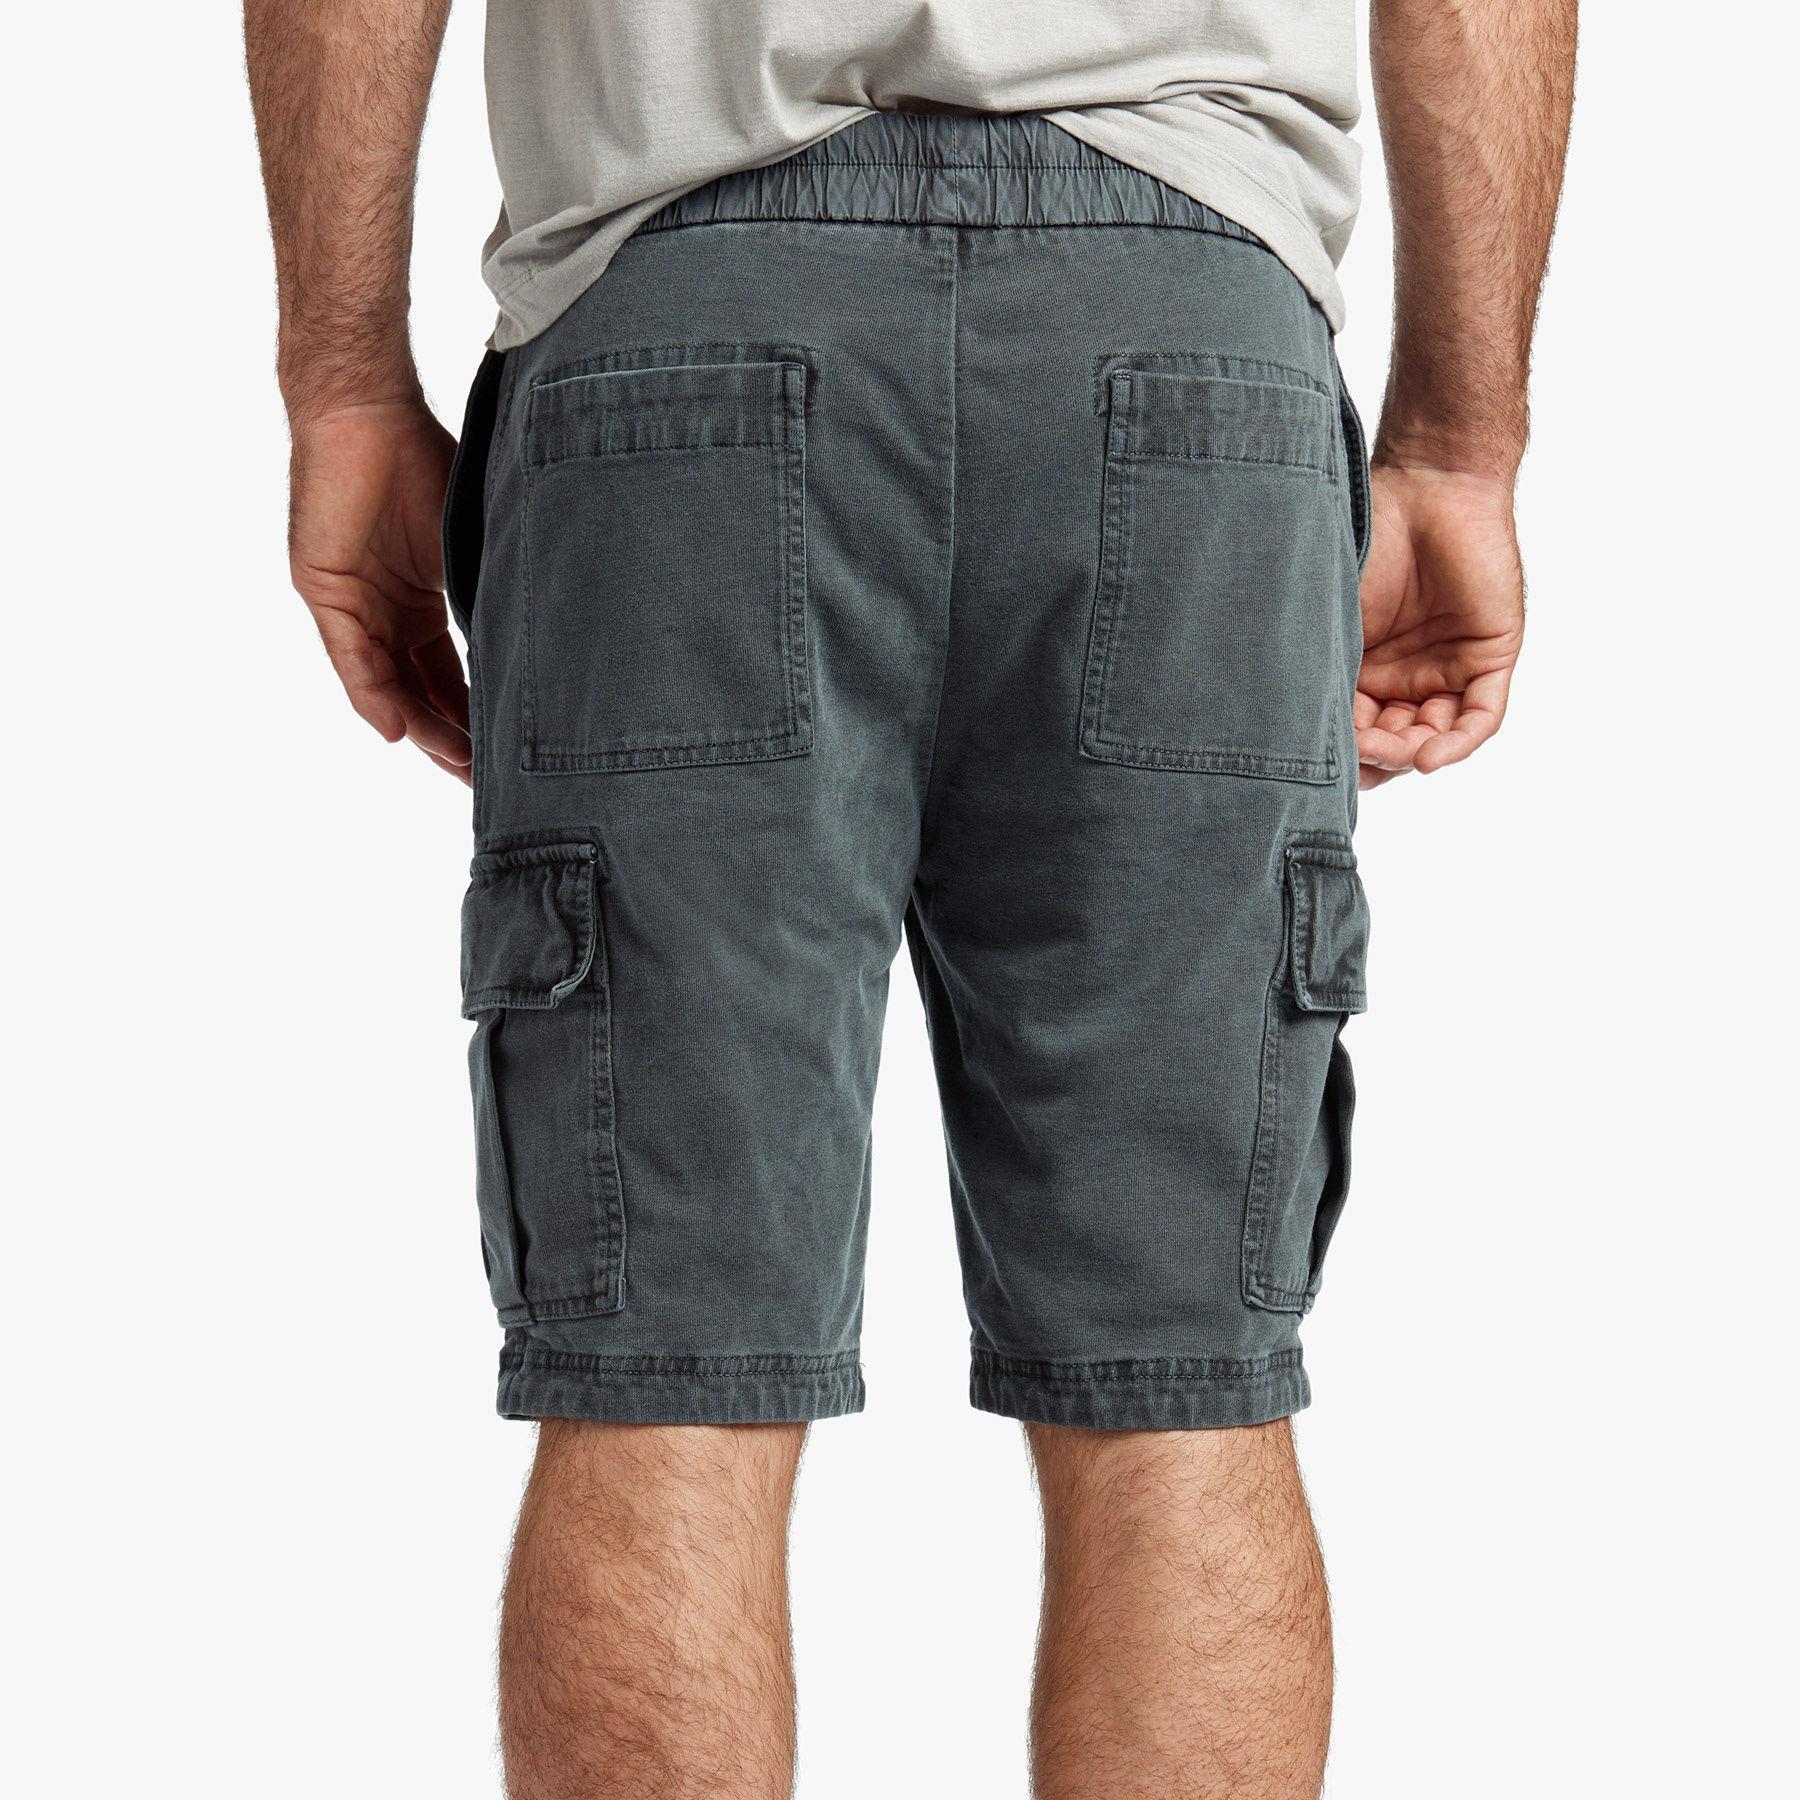 Cotton-jersey Drawstring Cargo Shorts James Perse 6z3YiP